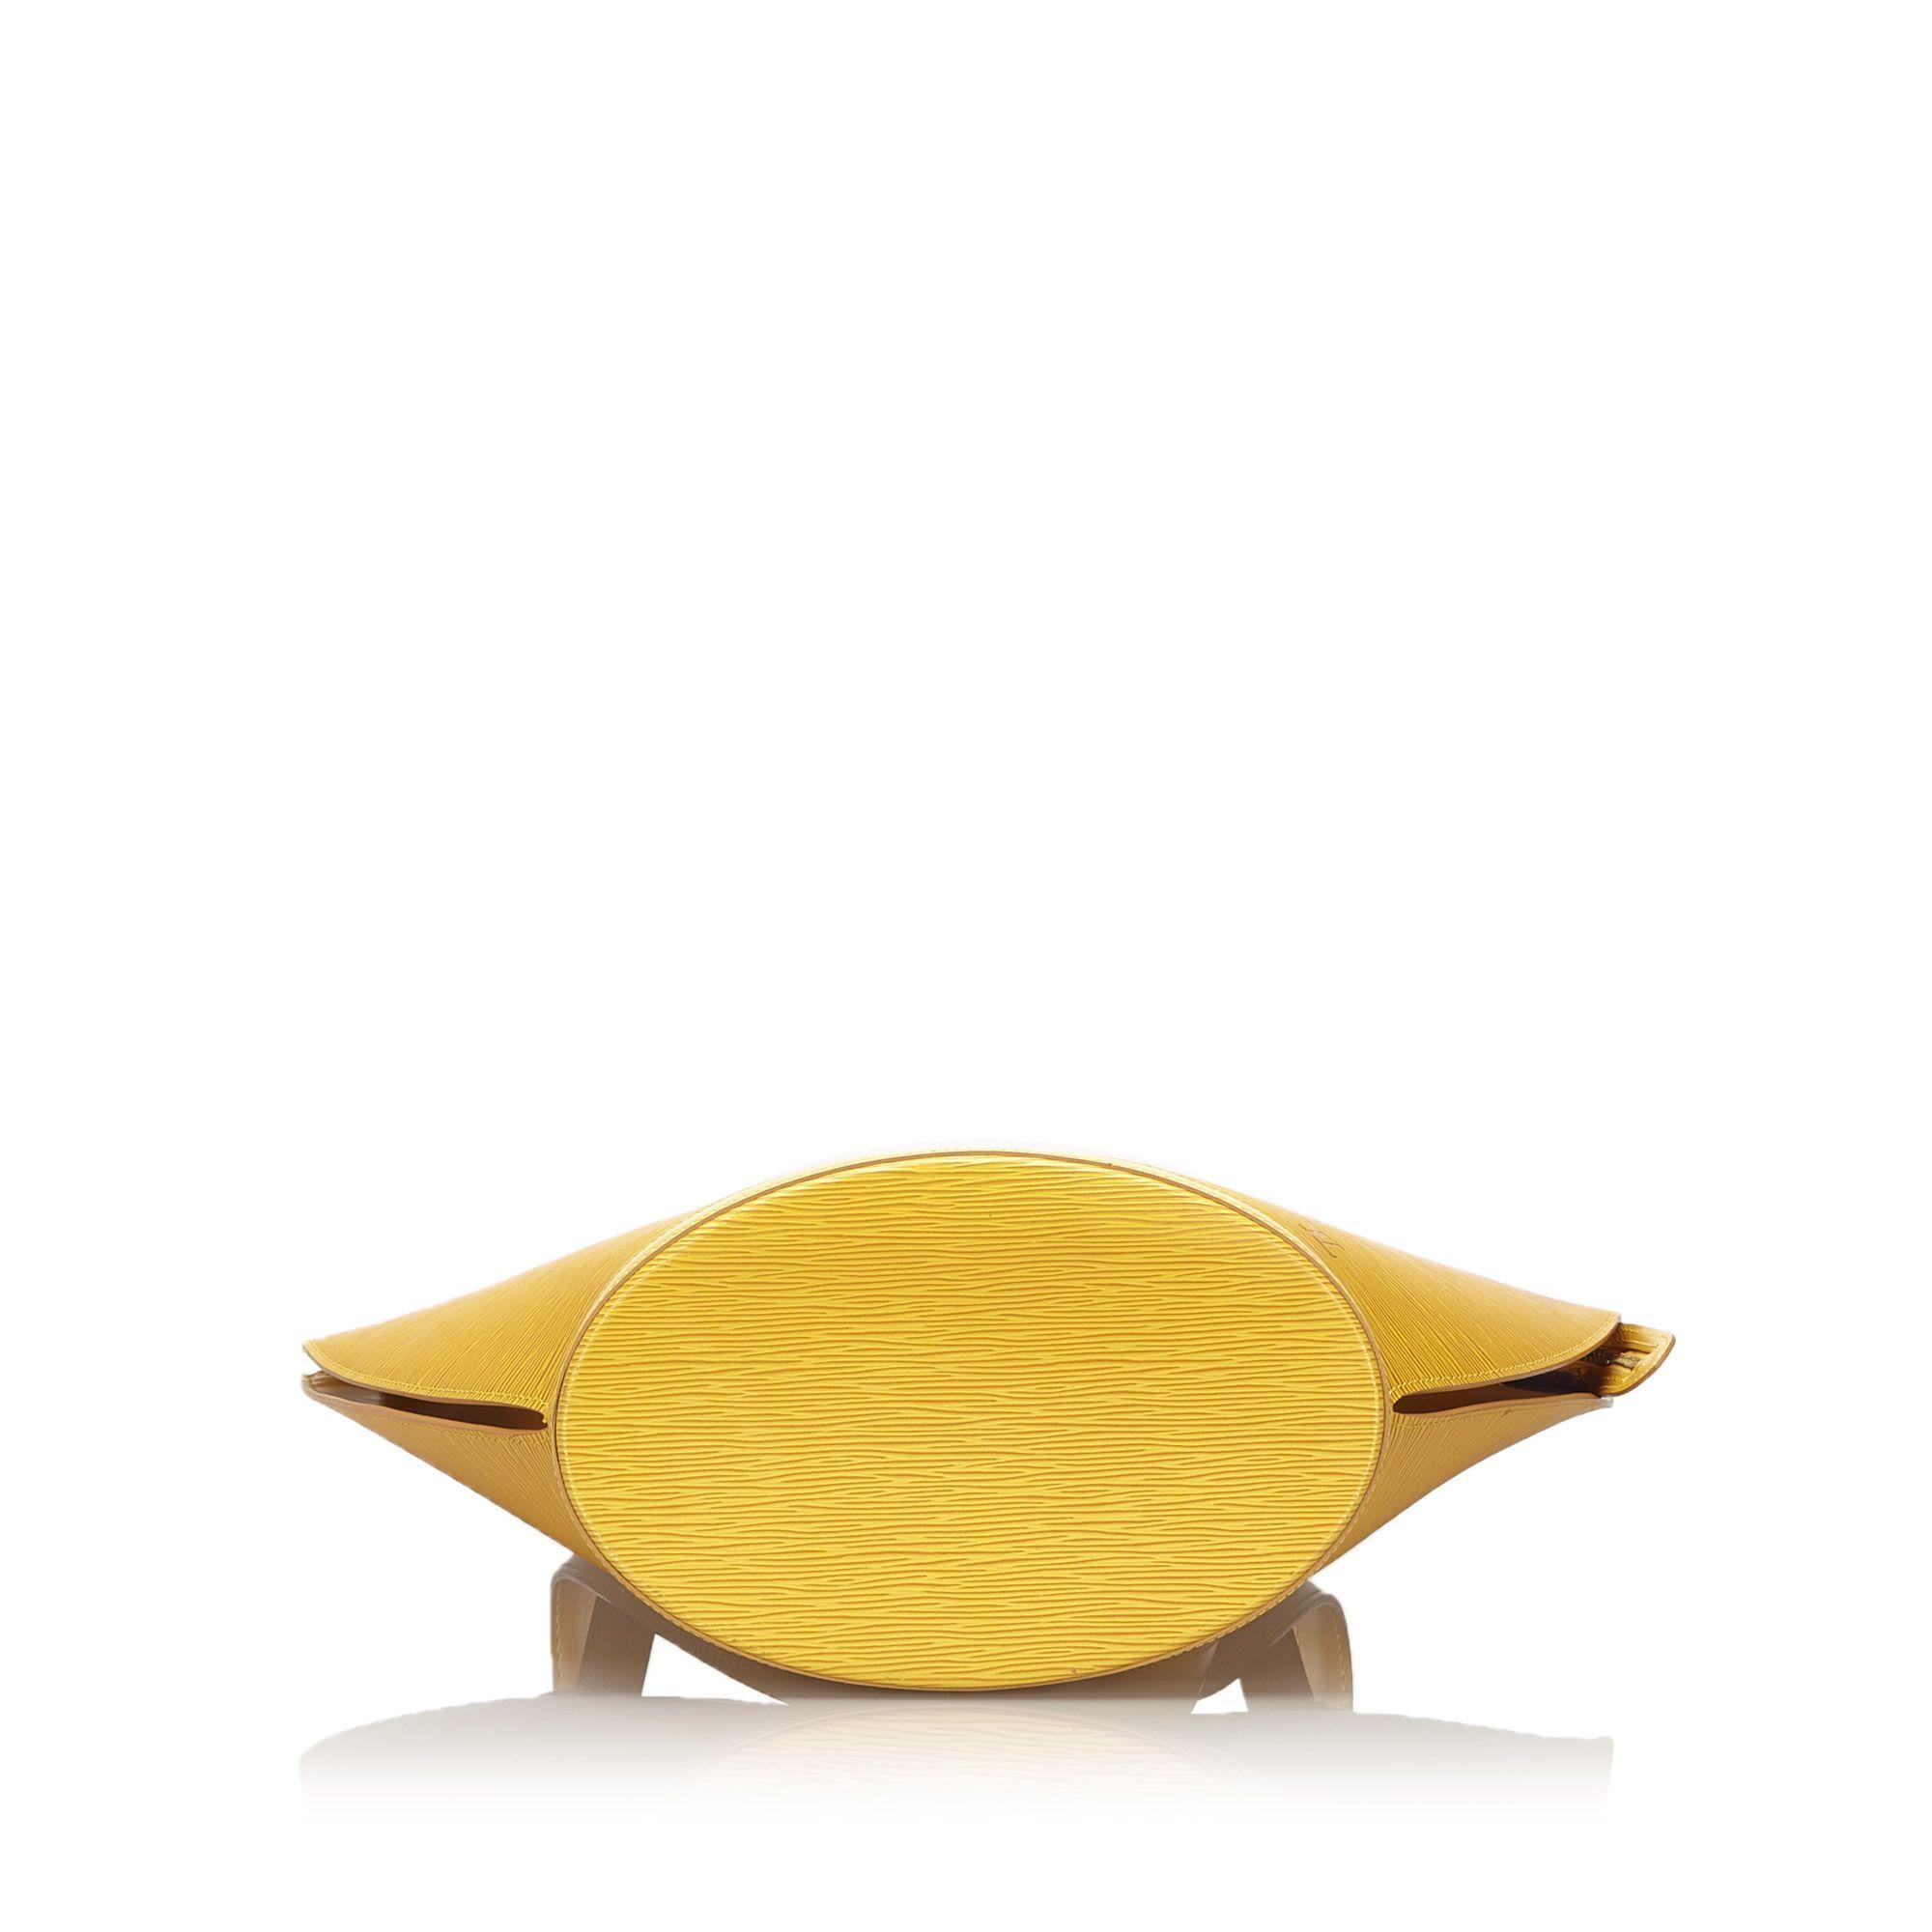 Vintage Louis Vuitton Epi Saint Jacques PM Long Strap Yellow